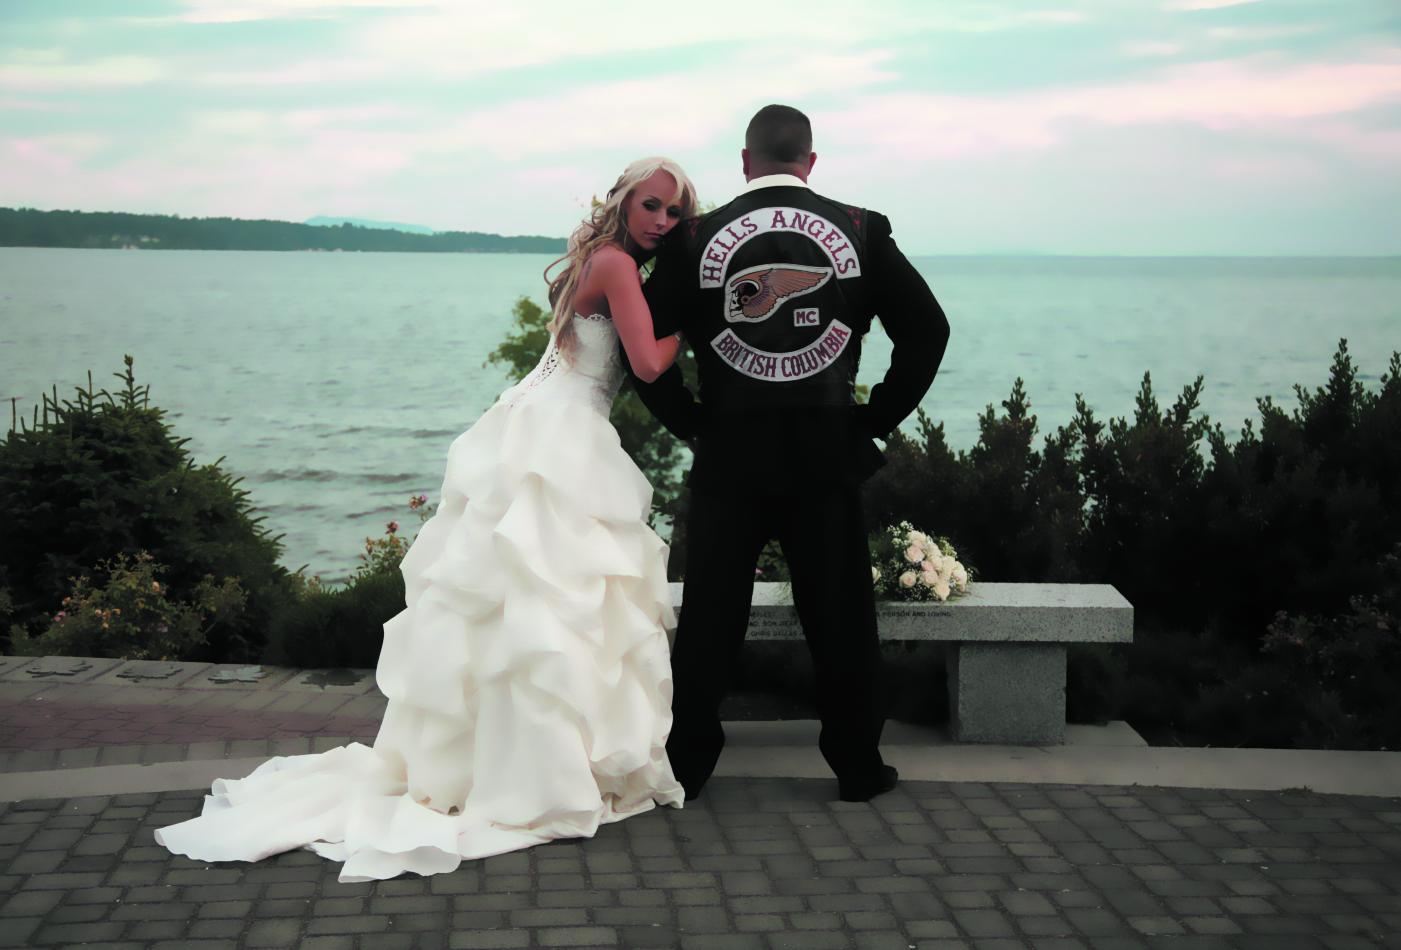 Kerri Krysko on her wedding day with her full patch Hells Angel ex-husband.